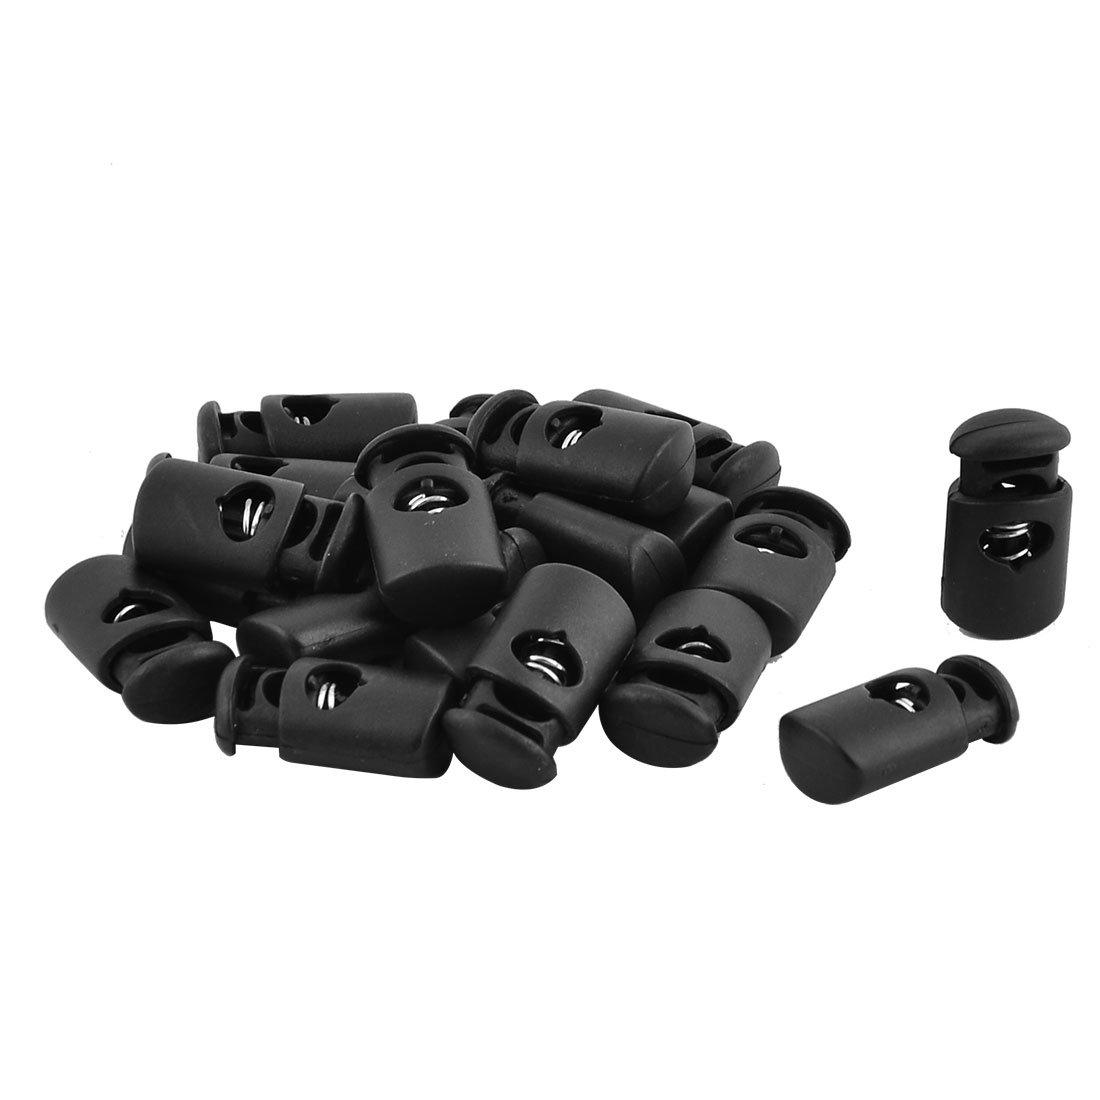 uxcell Plastic Adjustable Clothes Coat Drawstring Cord Lock Toggle Stopper Fastener 20pcs a16122200ux0044